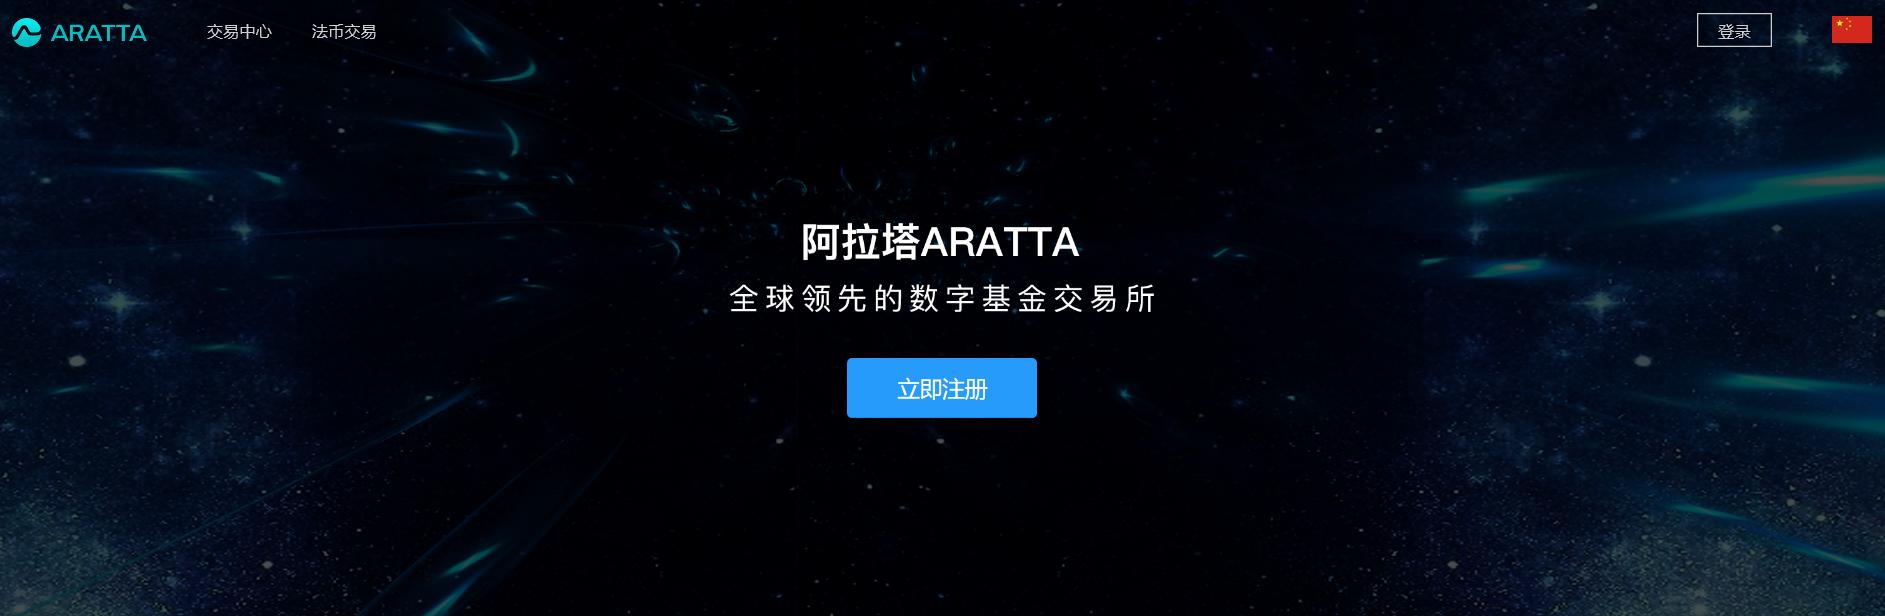 Aratta数字基金交易所能否引领牛市开端?